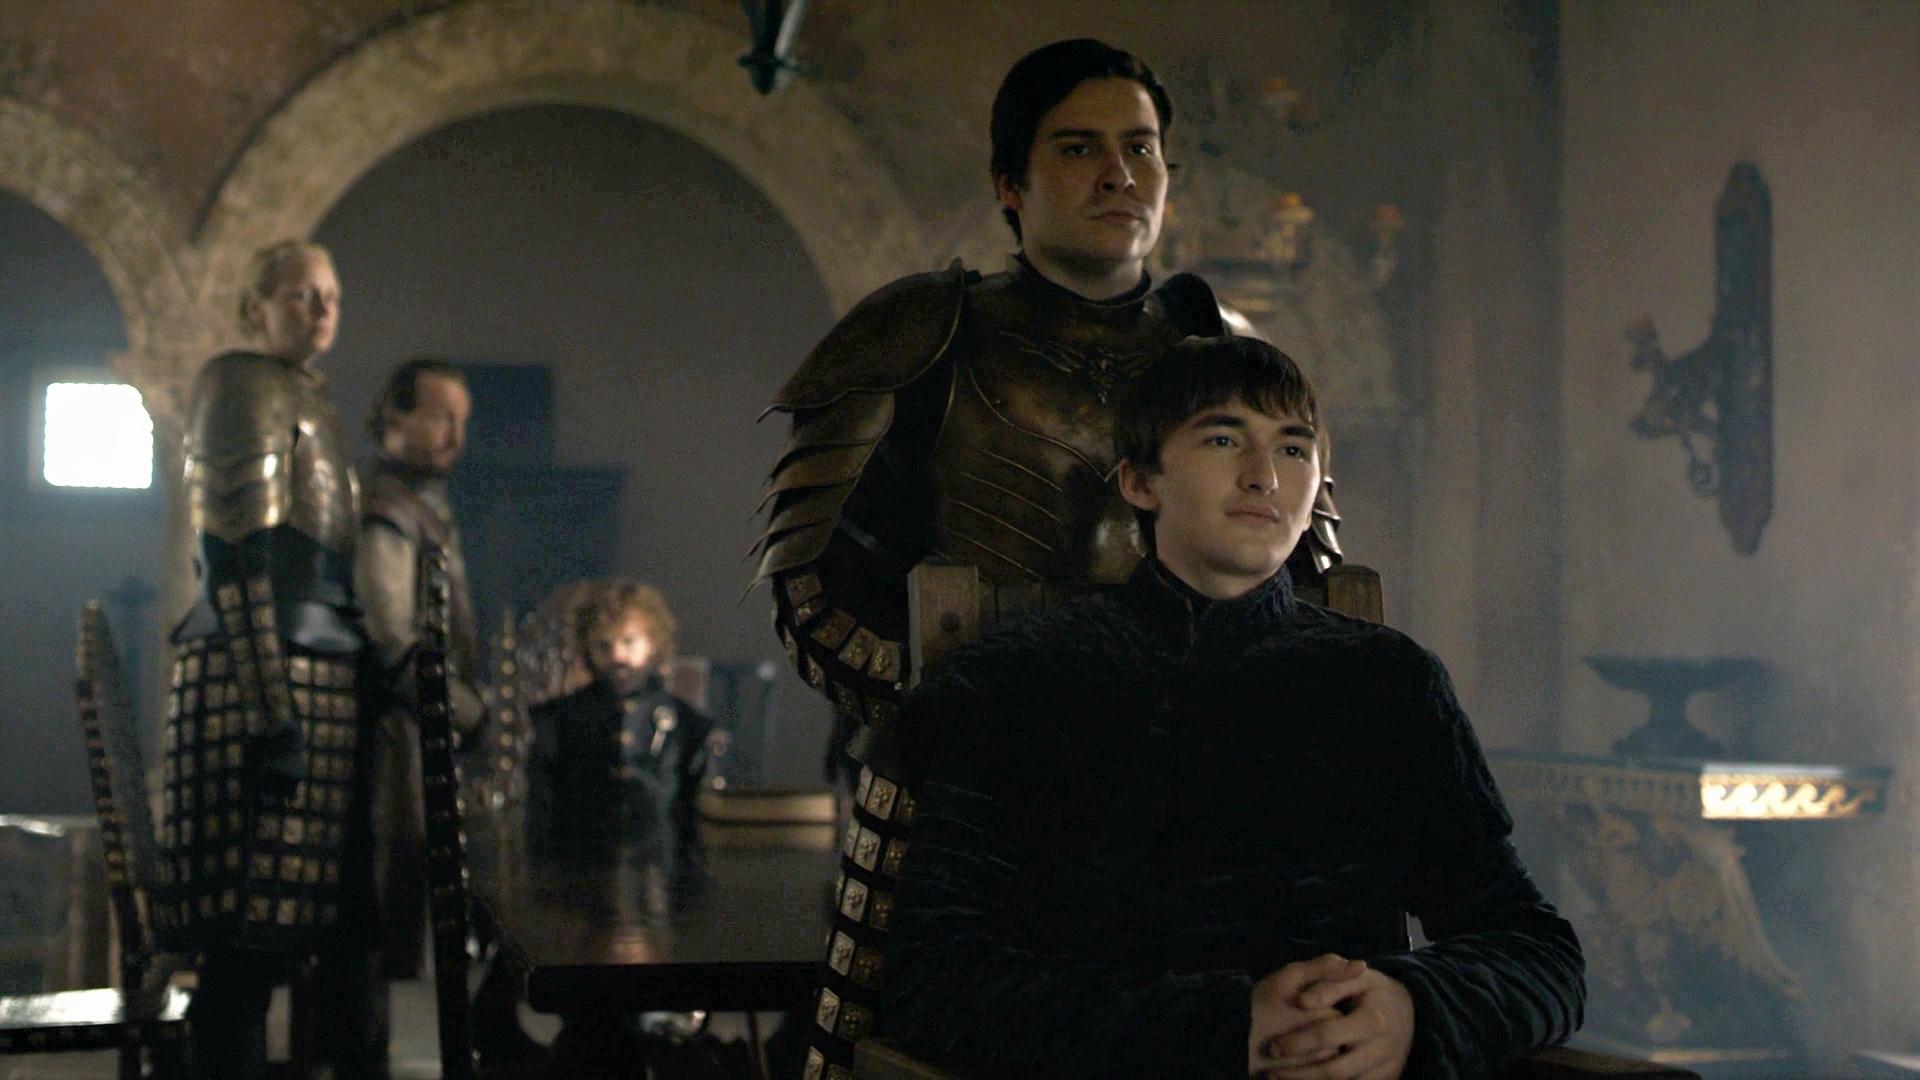 Bran Stark King Red Keep King's Landing Season 8 806 Iron Throne Podrick Brienne Bronn Tyrion